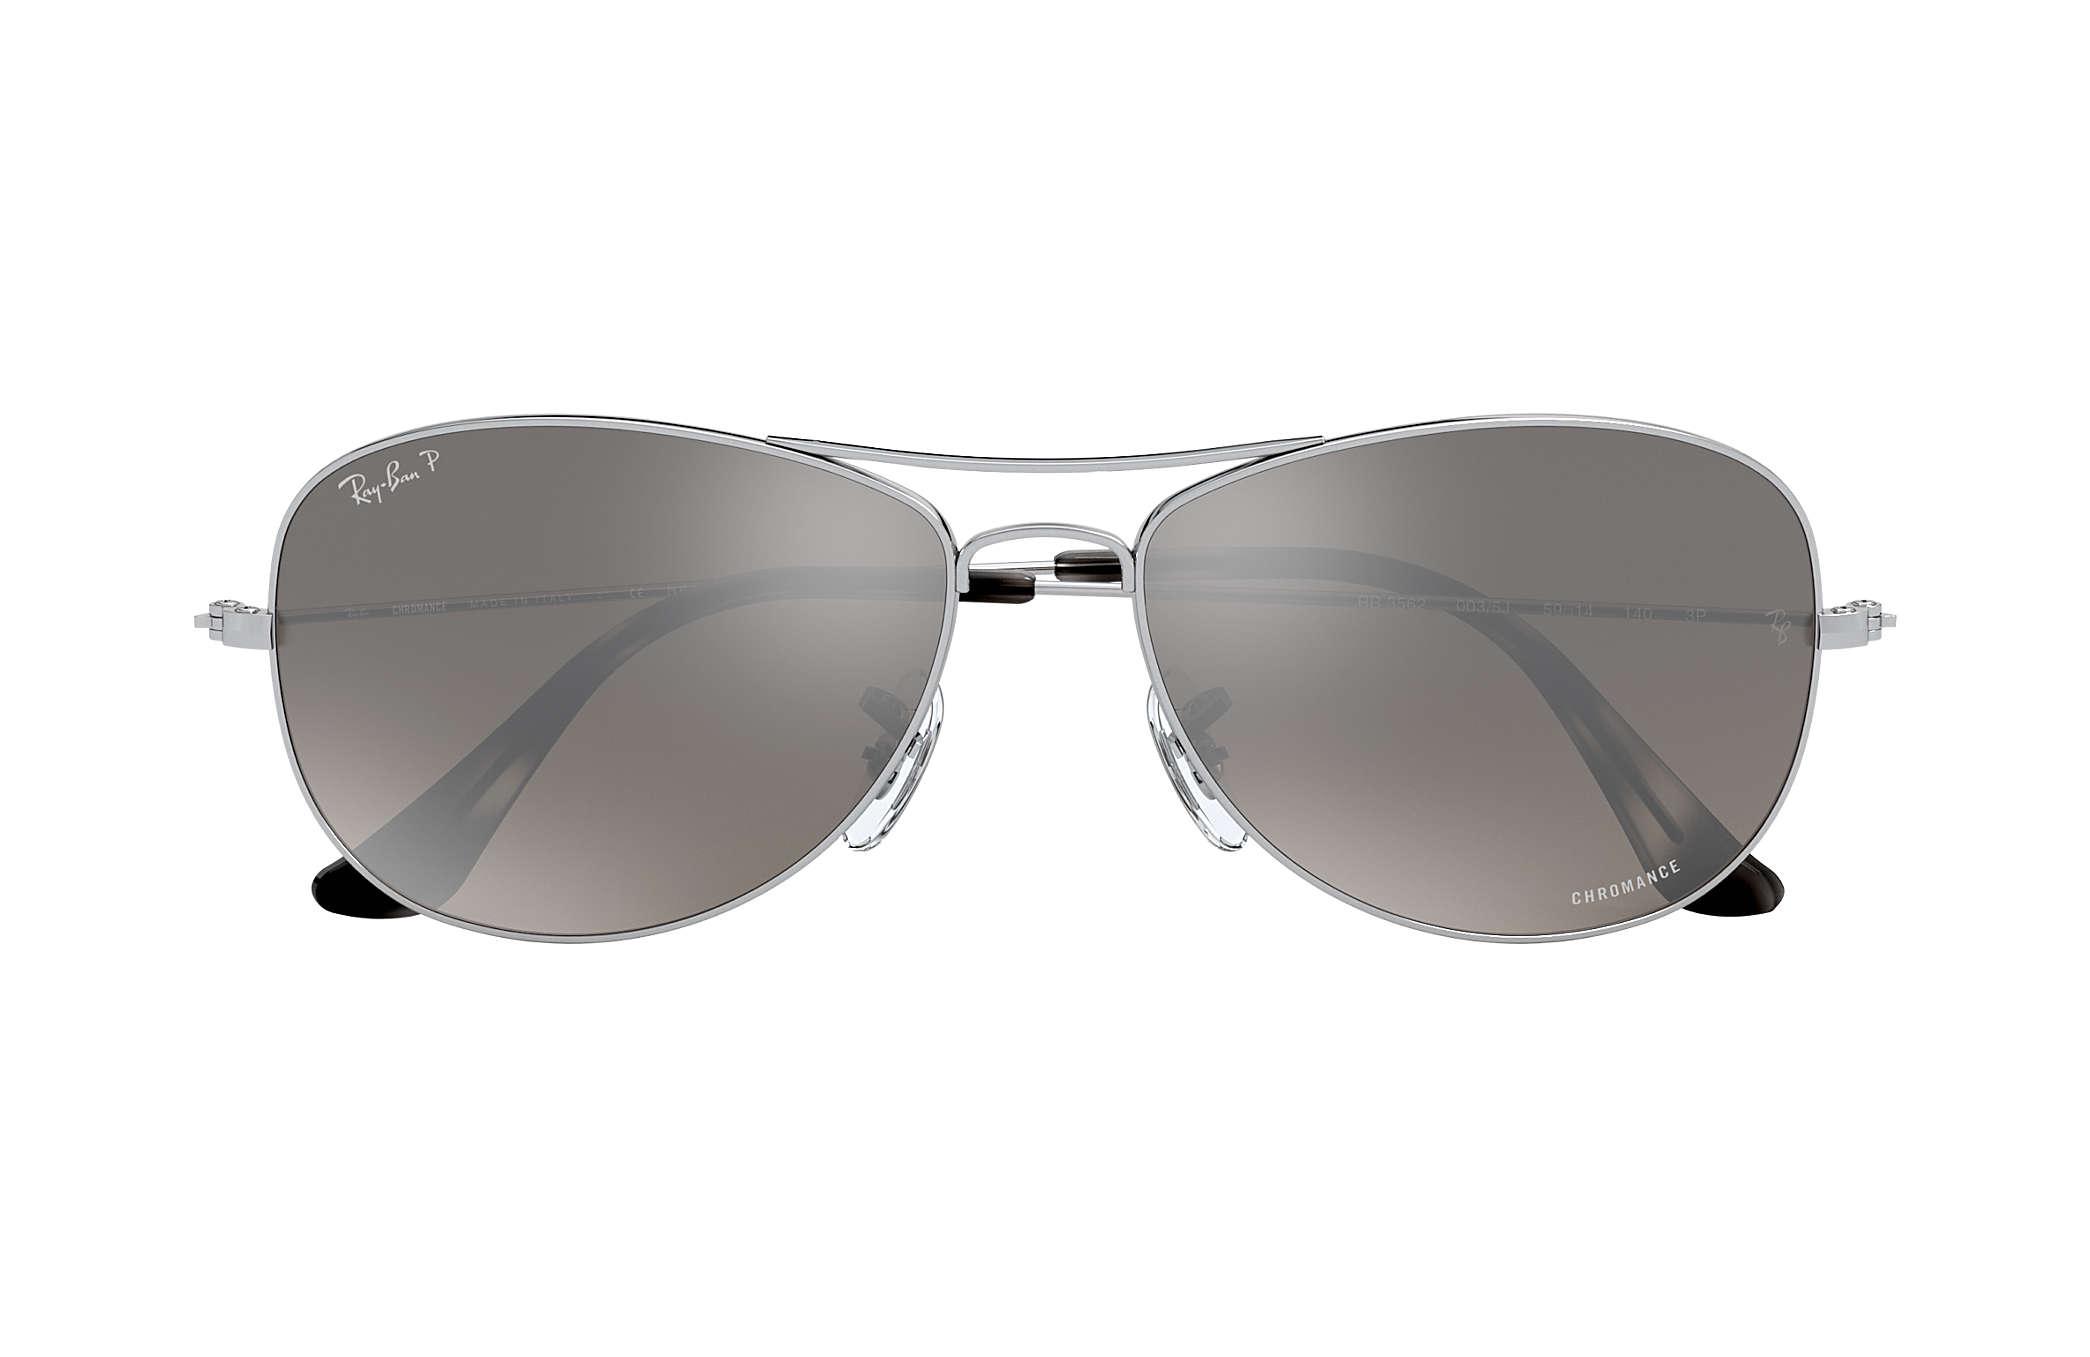 2165c5cd8a Ray-Ban Rb3562 Chromance RB3562 Silver - Metal - Silver Polarized ...